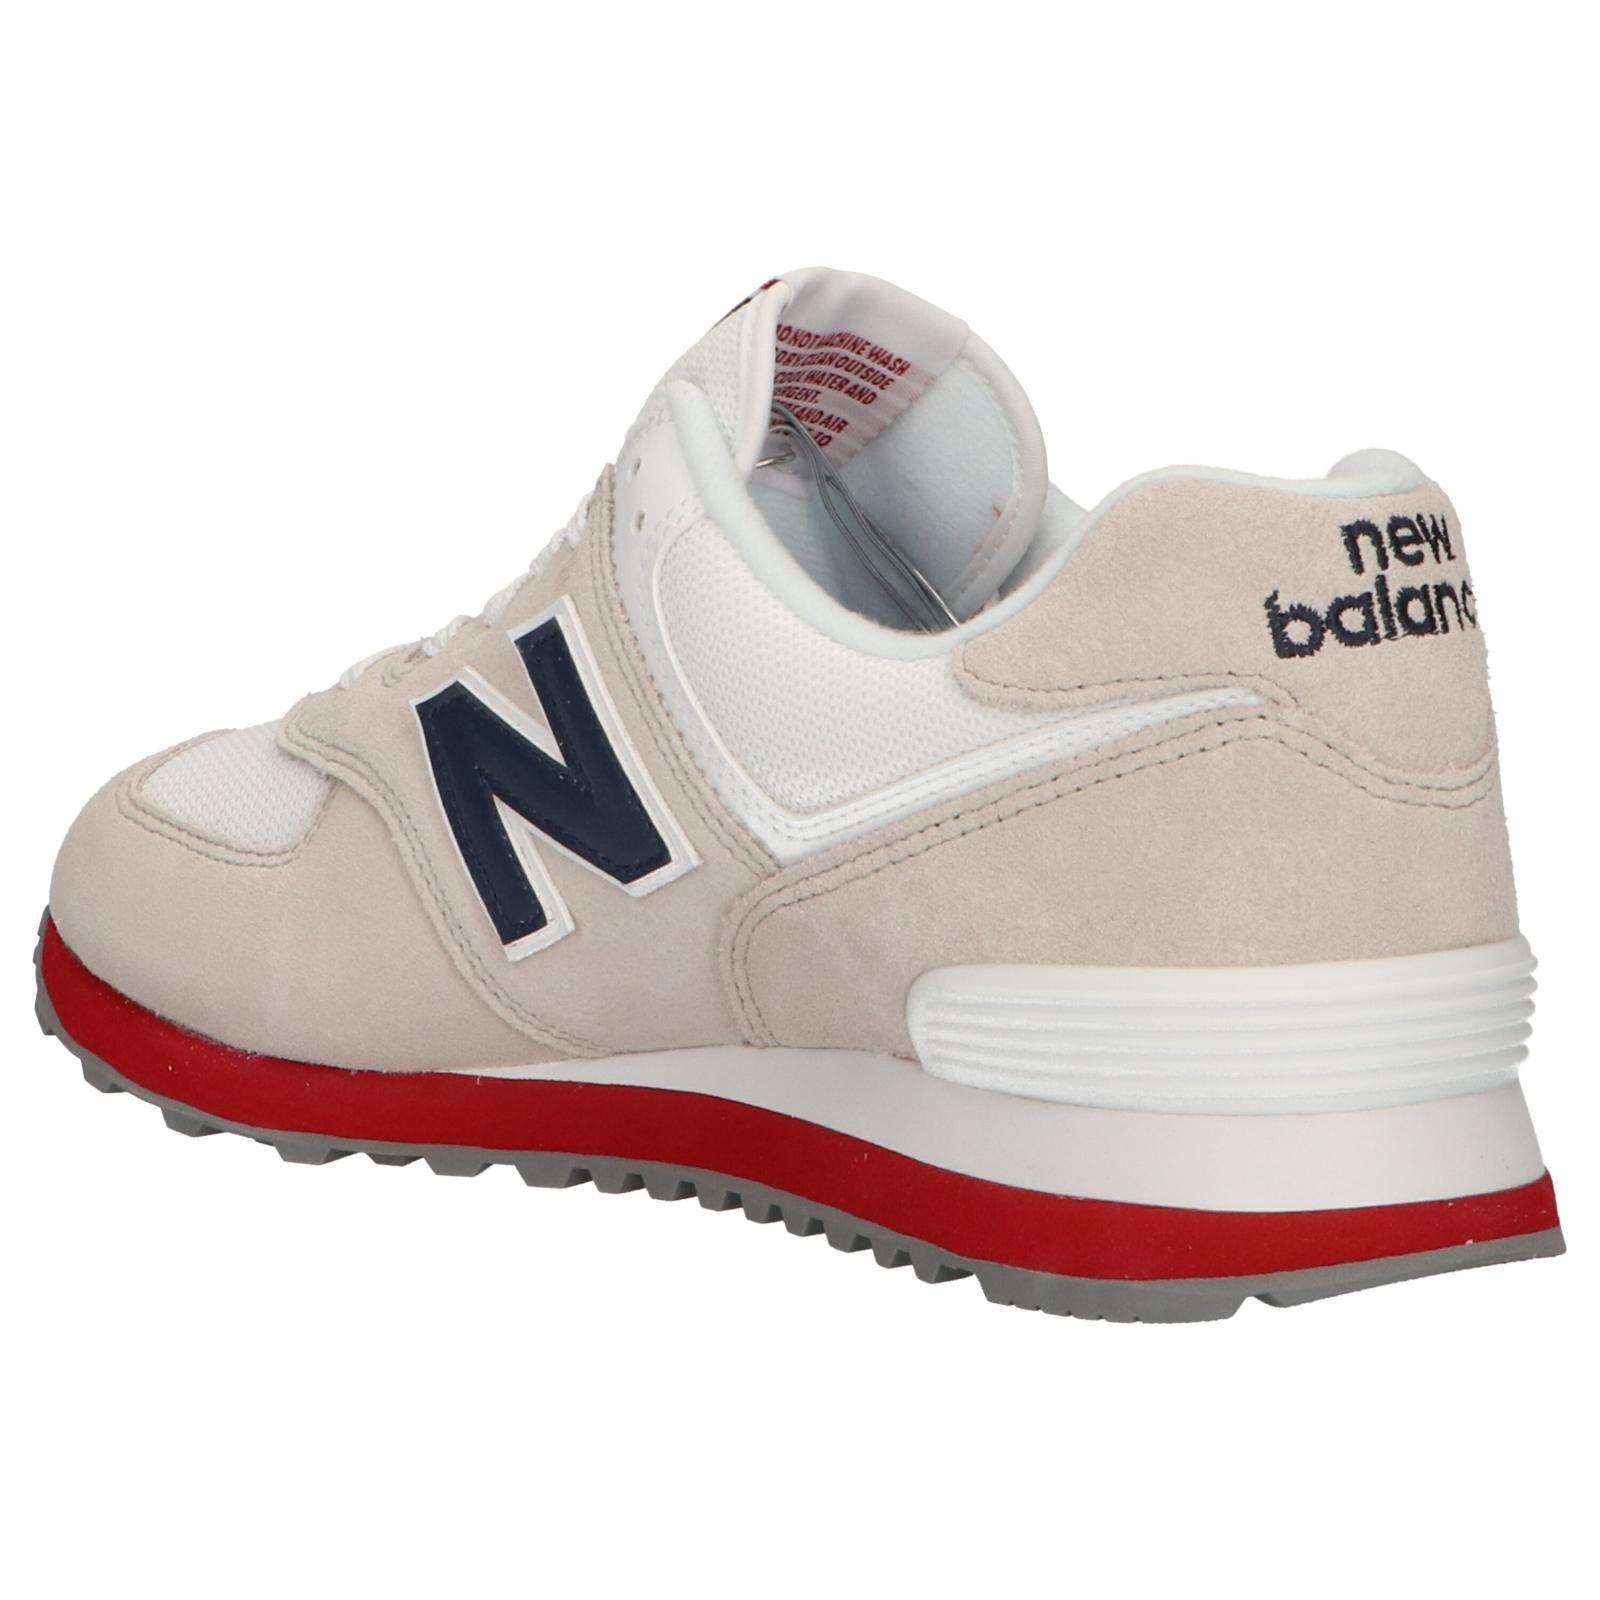 zapatillas de verano hombre new balance